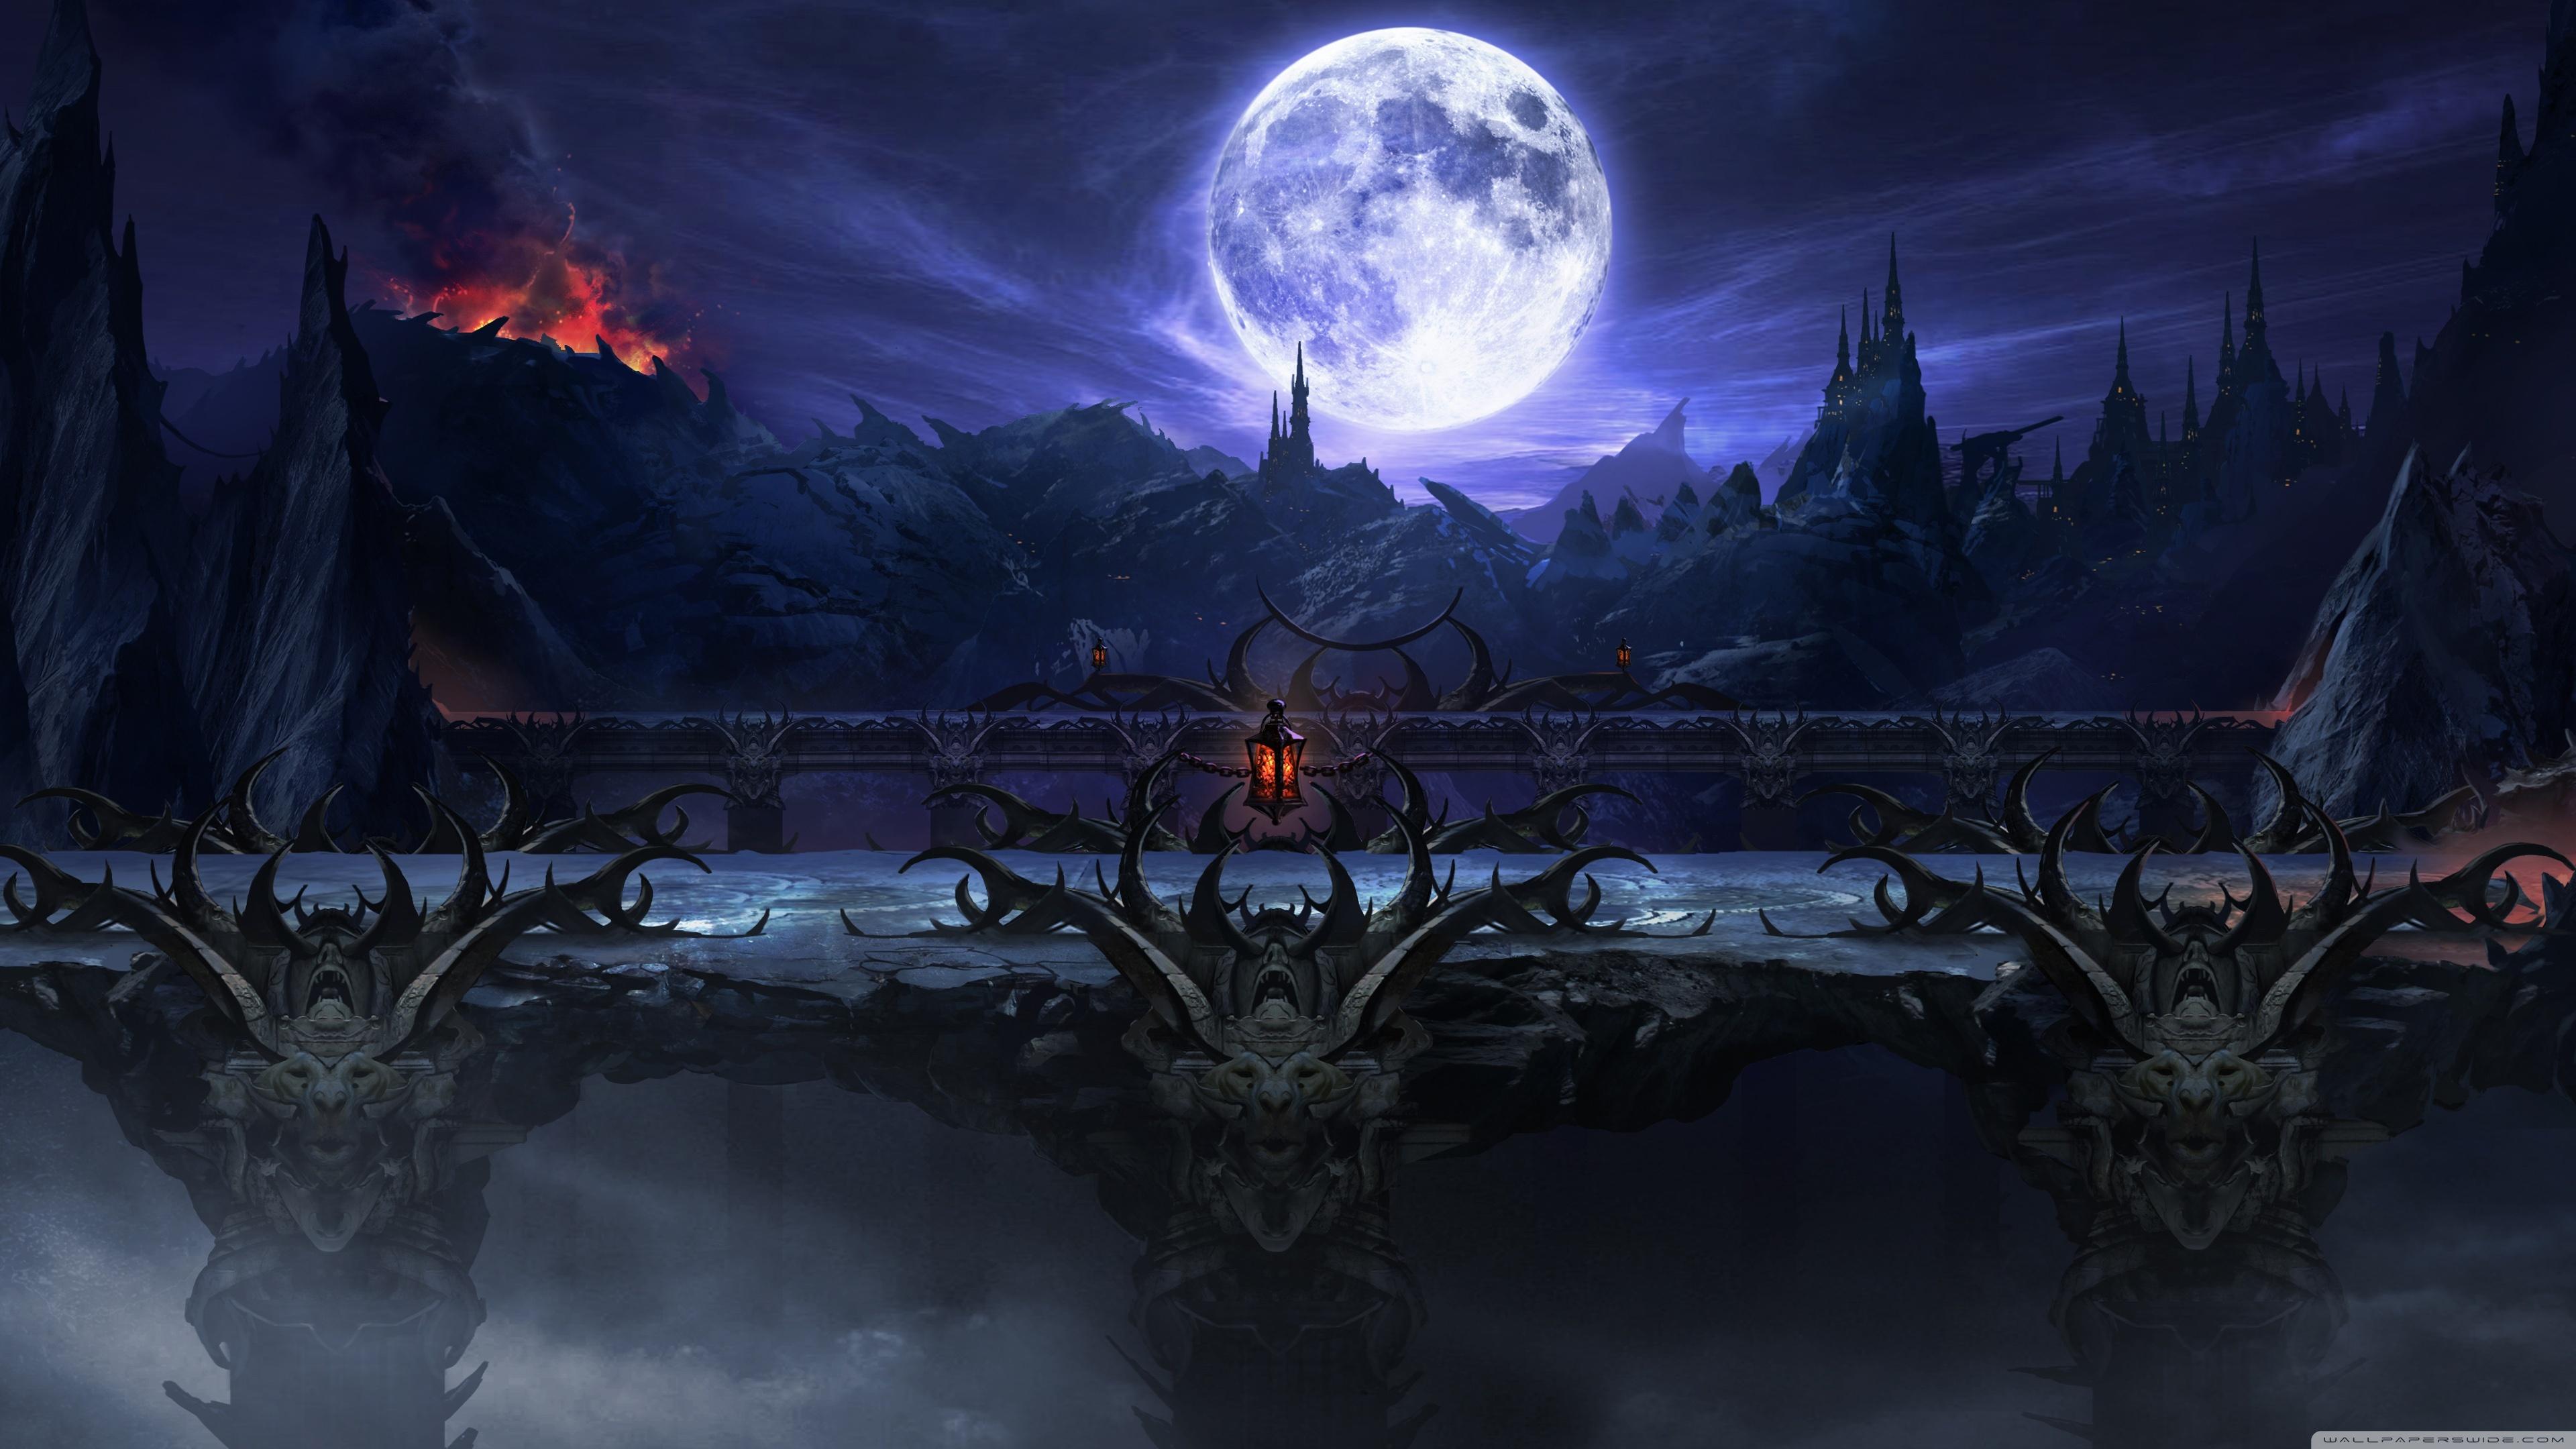 Mortal Kombat X 2015 Background HD Wide Wallpaper for Widescreen